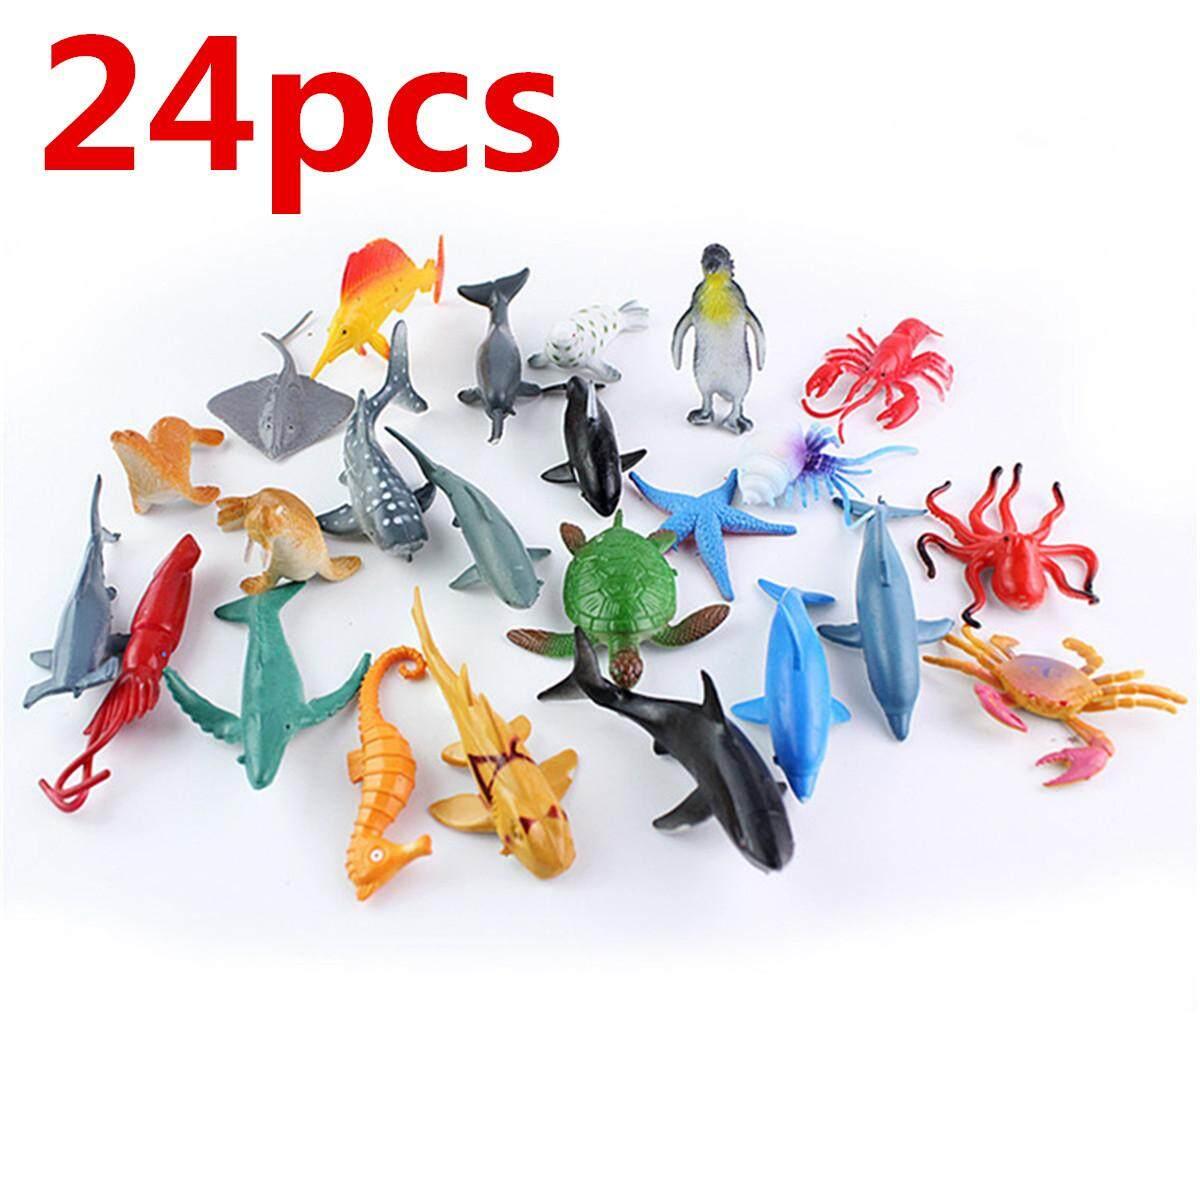 24pcs/set Plastic Ocean Animals Figure Sea Dolphin Turtle Creatures Model Toys By Moonbeam.